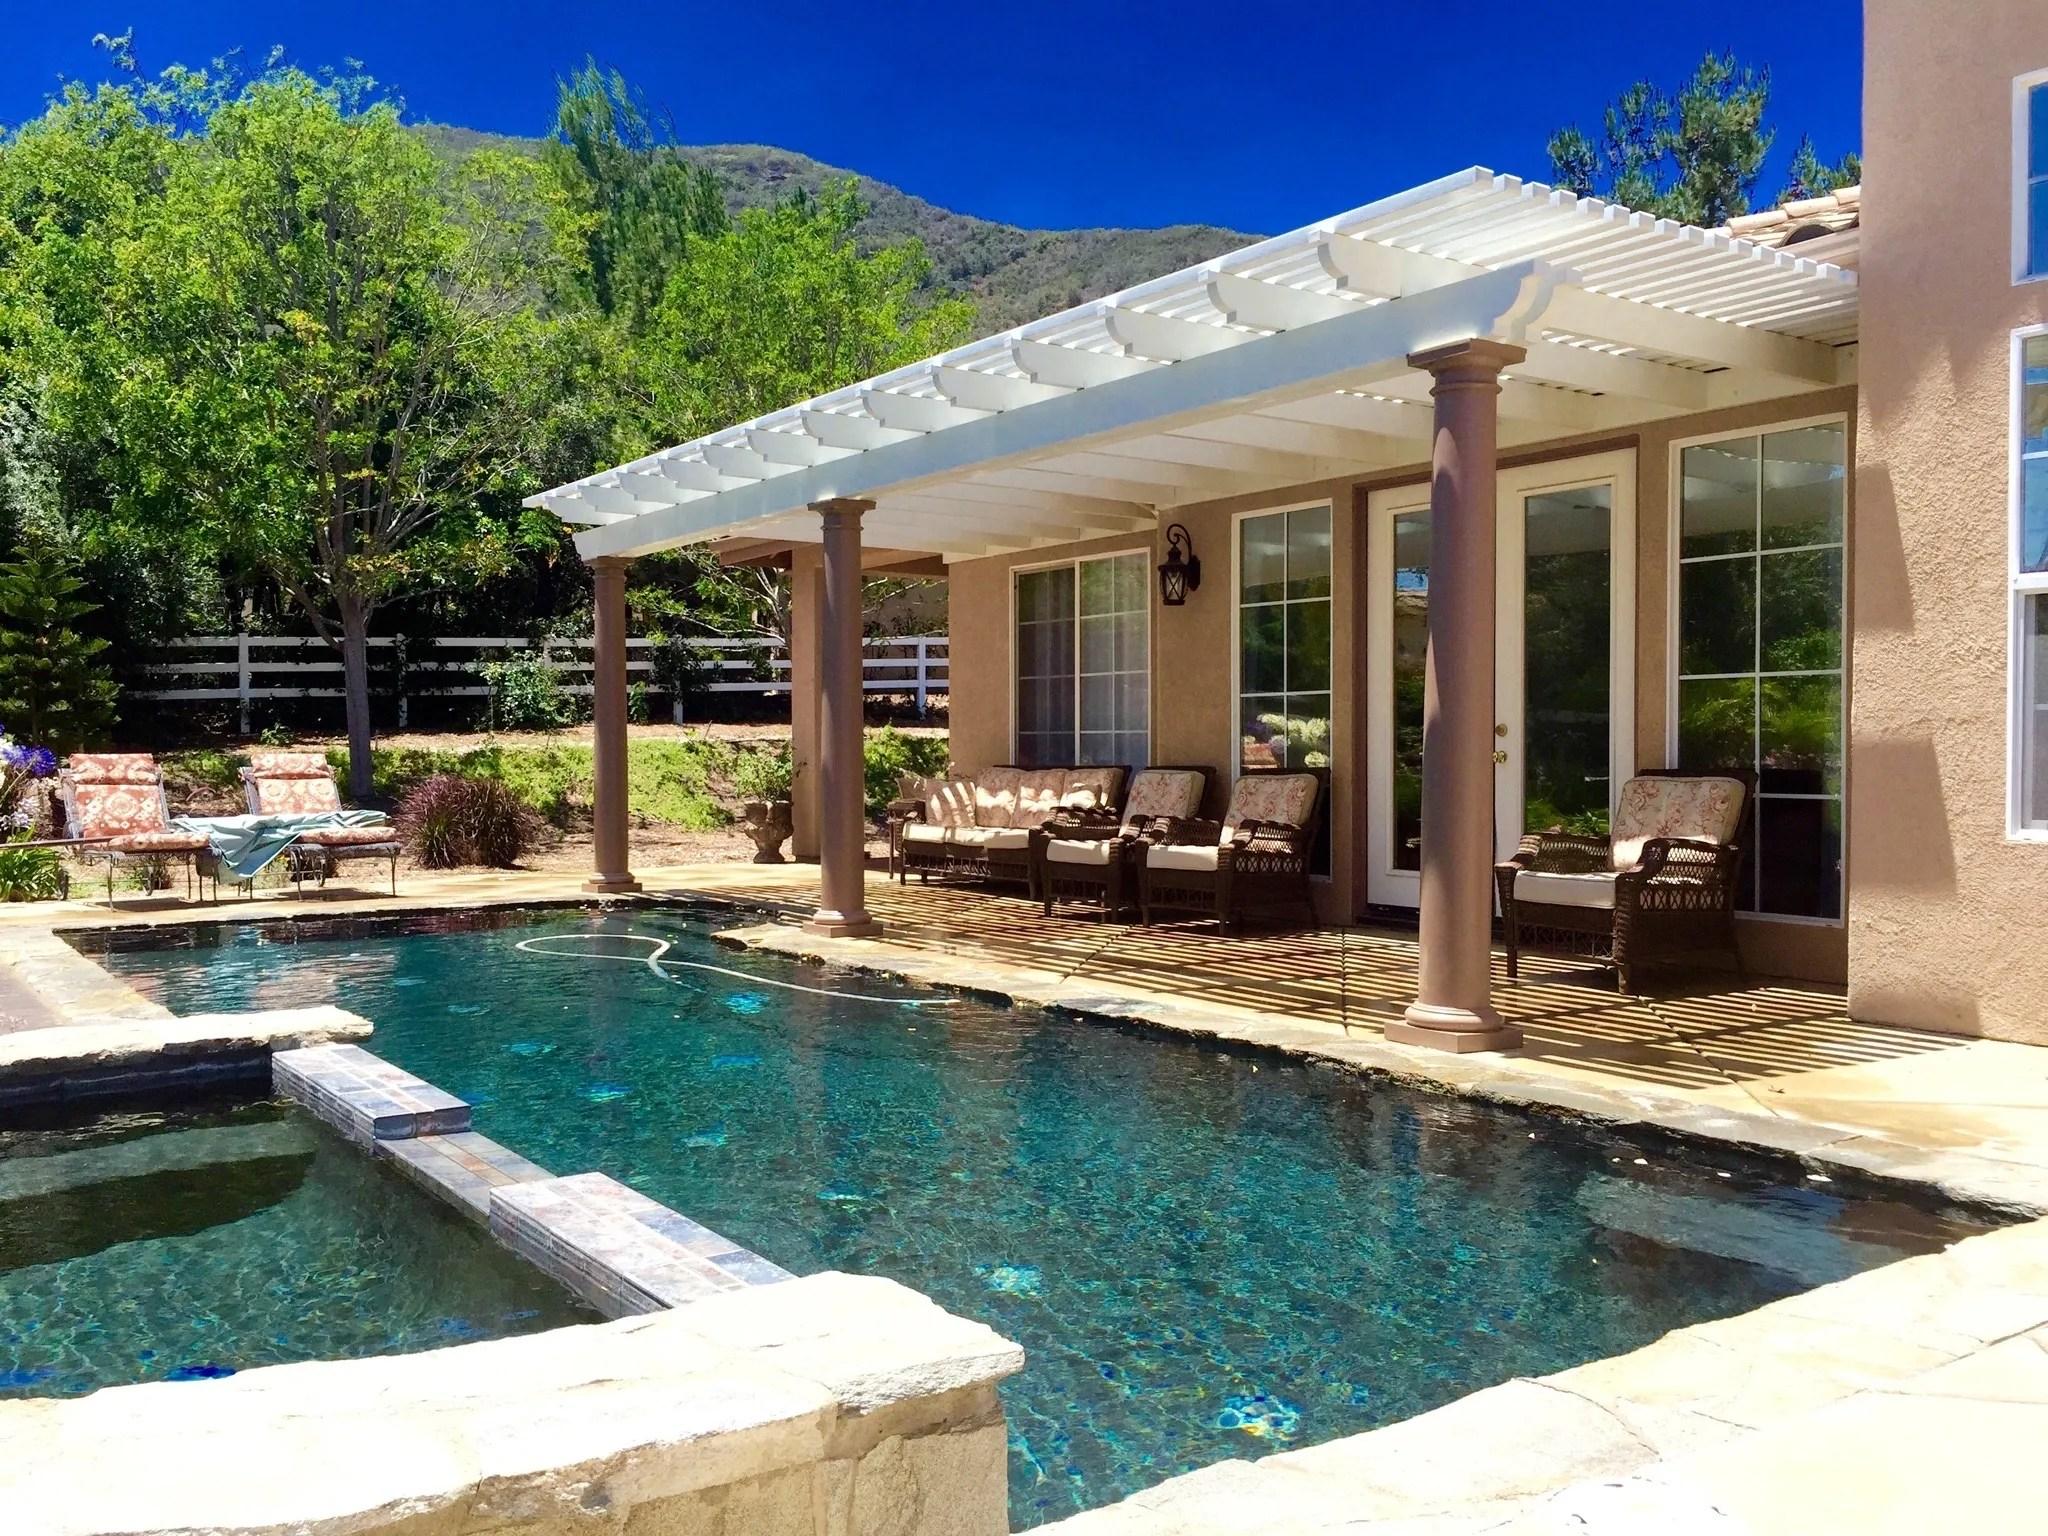 southern california patios patio